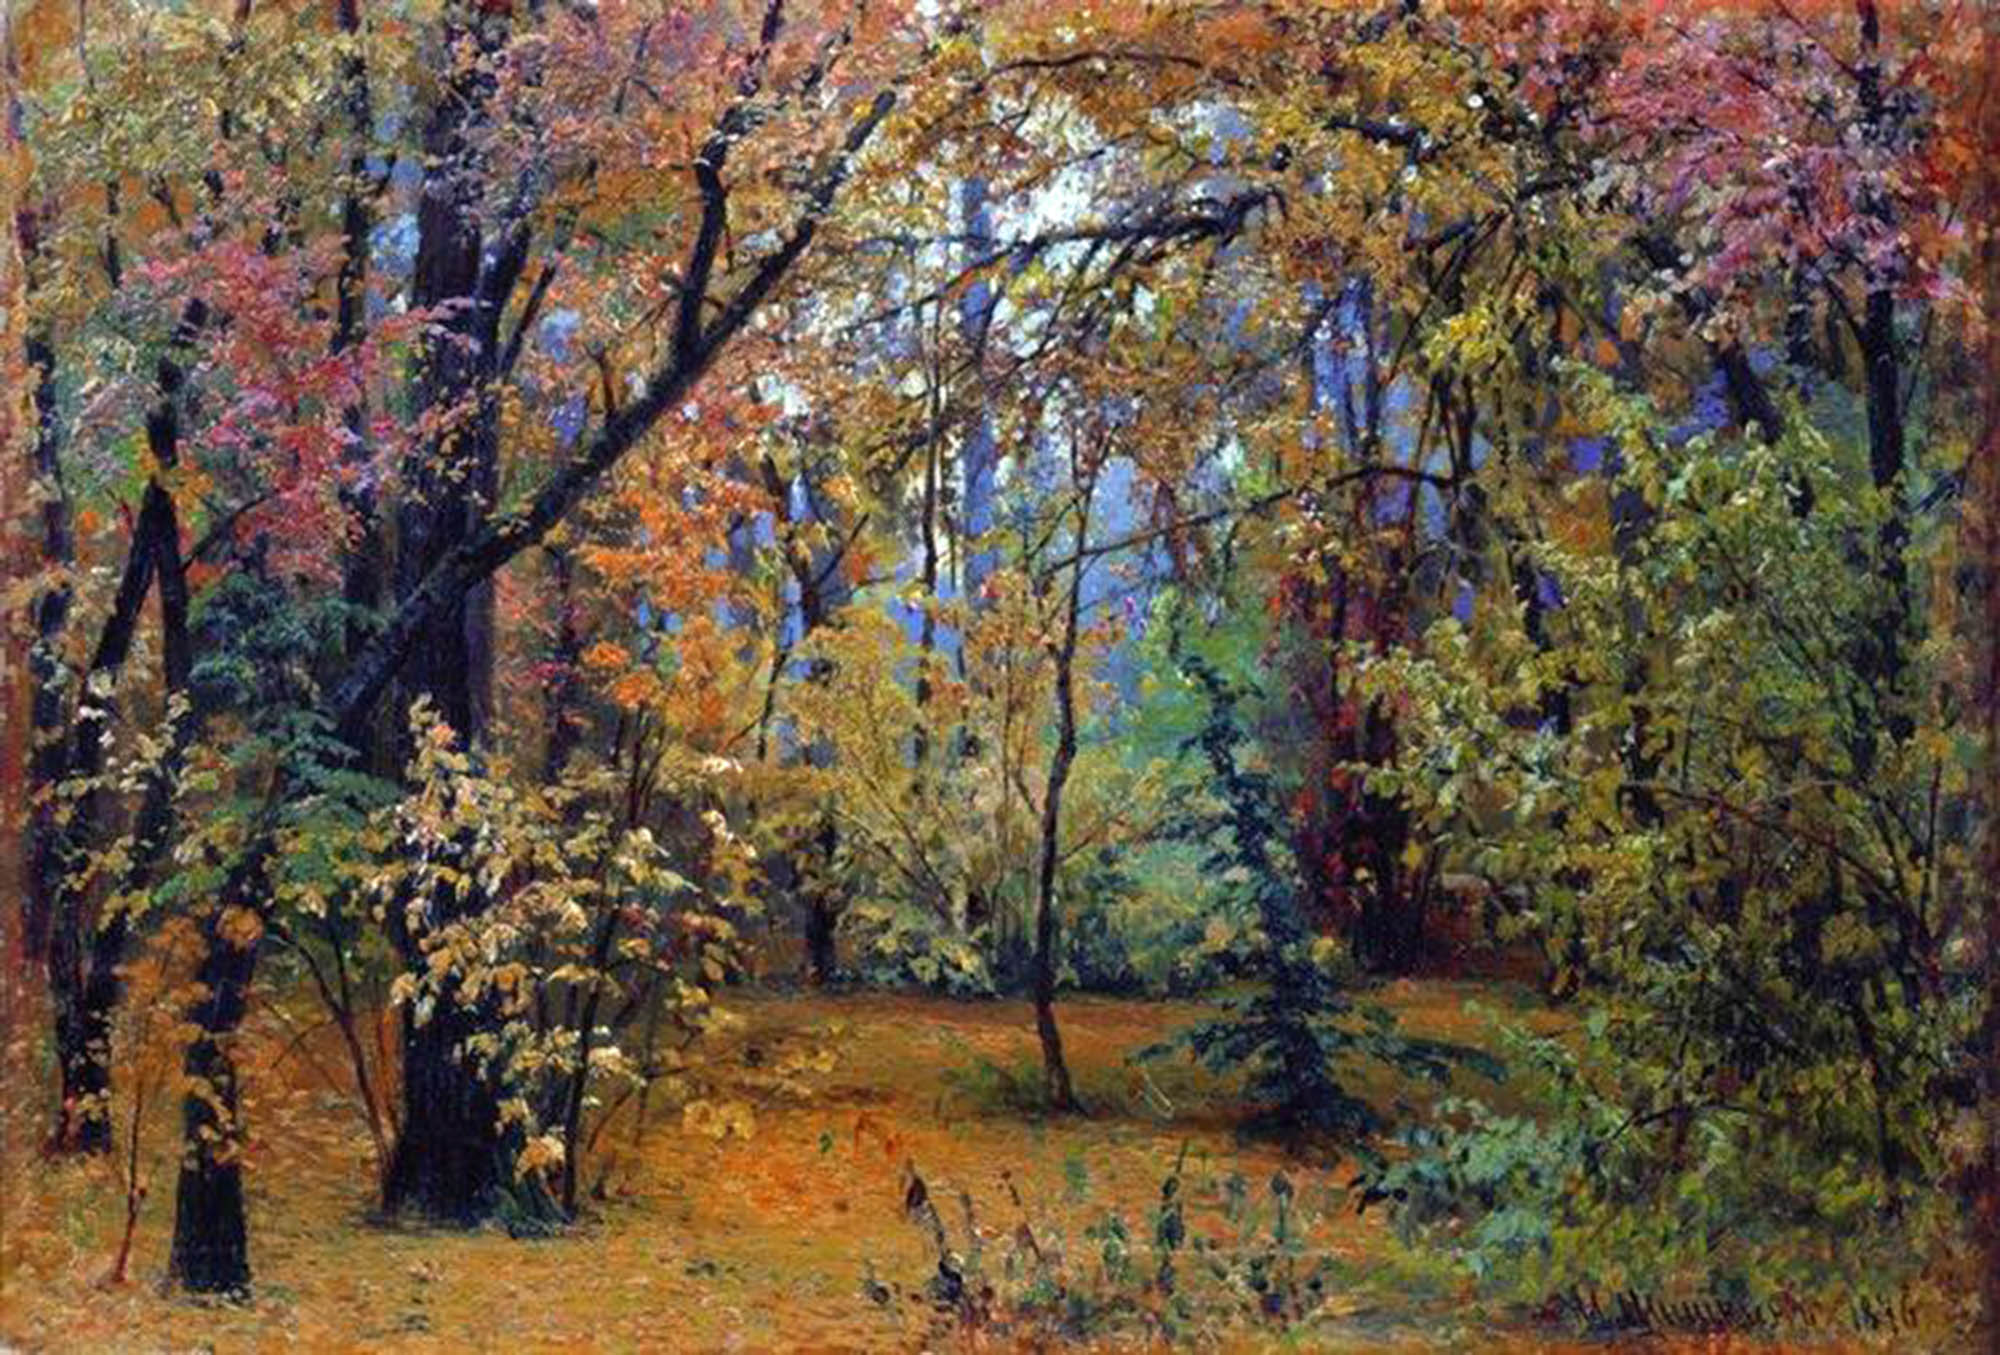 Ivan Ivanovič Šhišhkin, Foresta in autunno, 1876